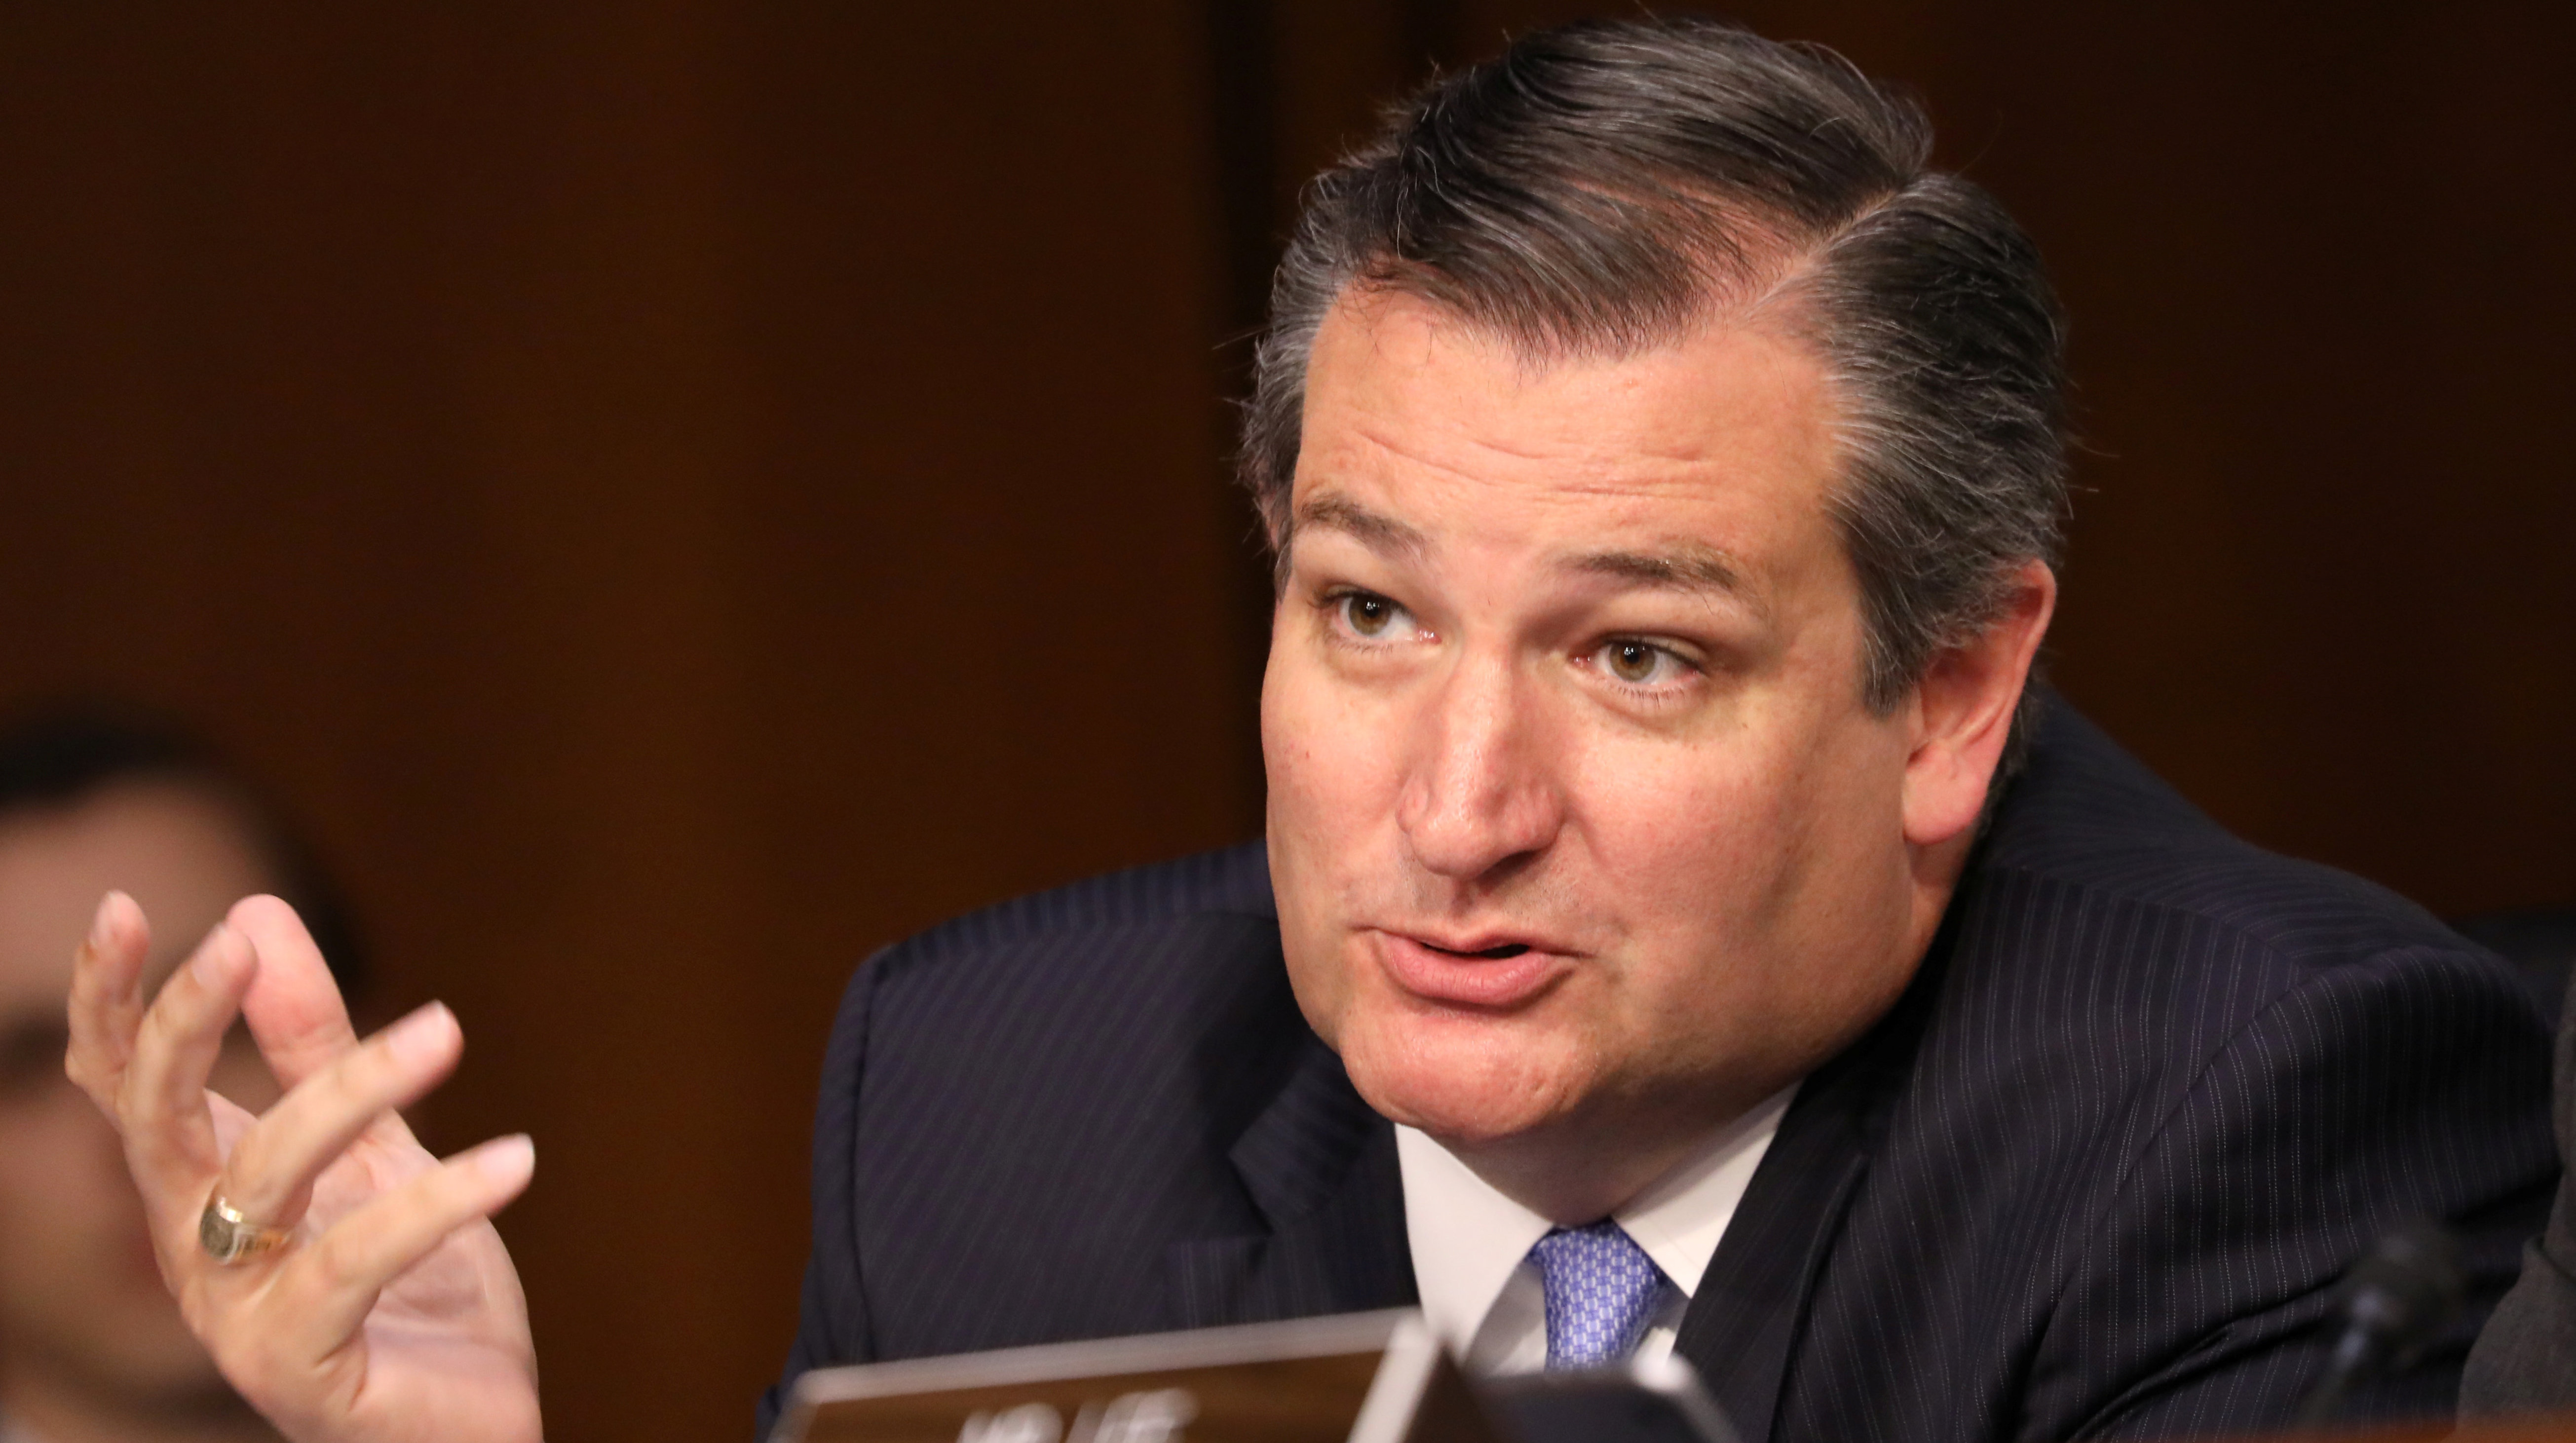 Sen. Ted Cruz Calls Rival Beto O'Rourke 'Quick' To Blame Dallas Cop Who Killed Botham Jean